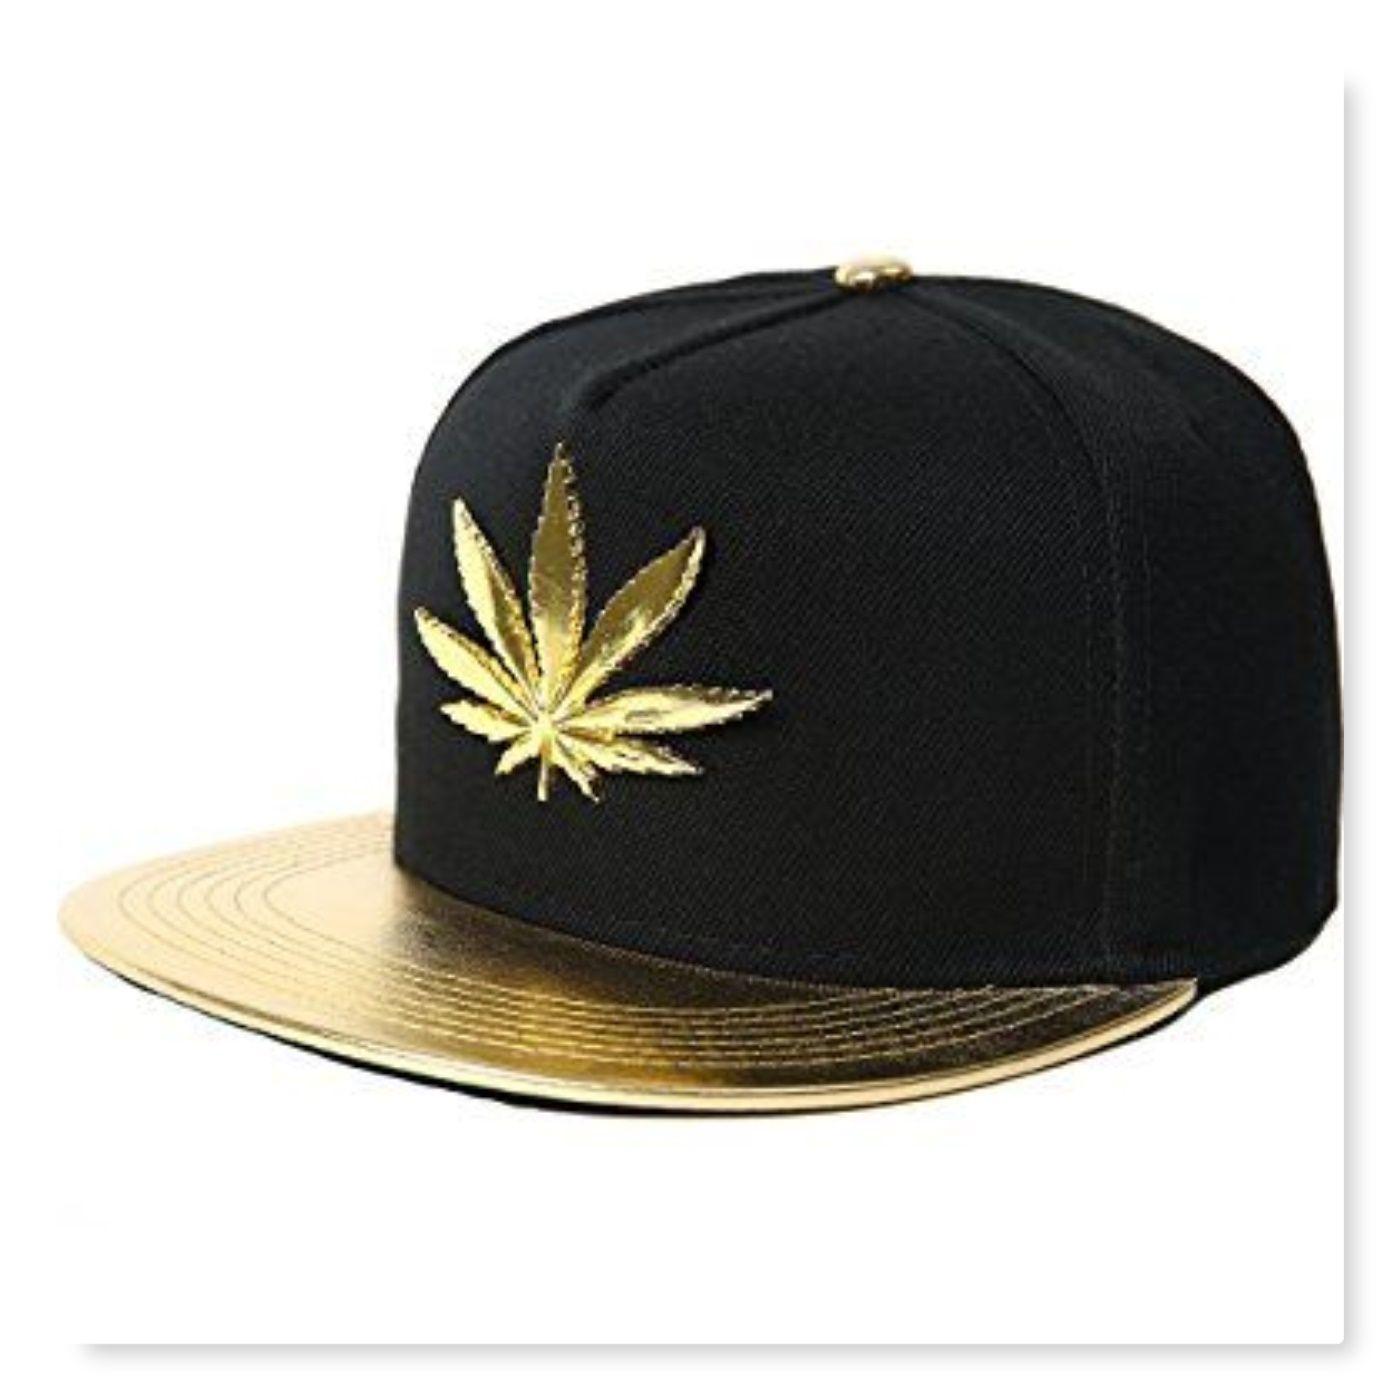 Marijuana Cannabis hat 3D Gold weeds embroidered Snapback Baseball cap Gray